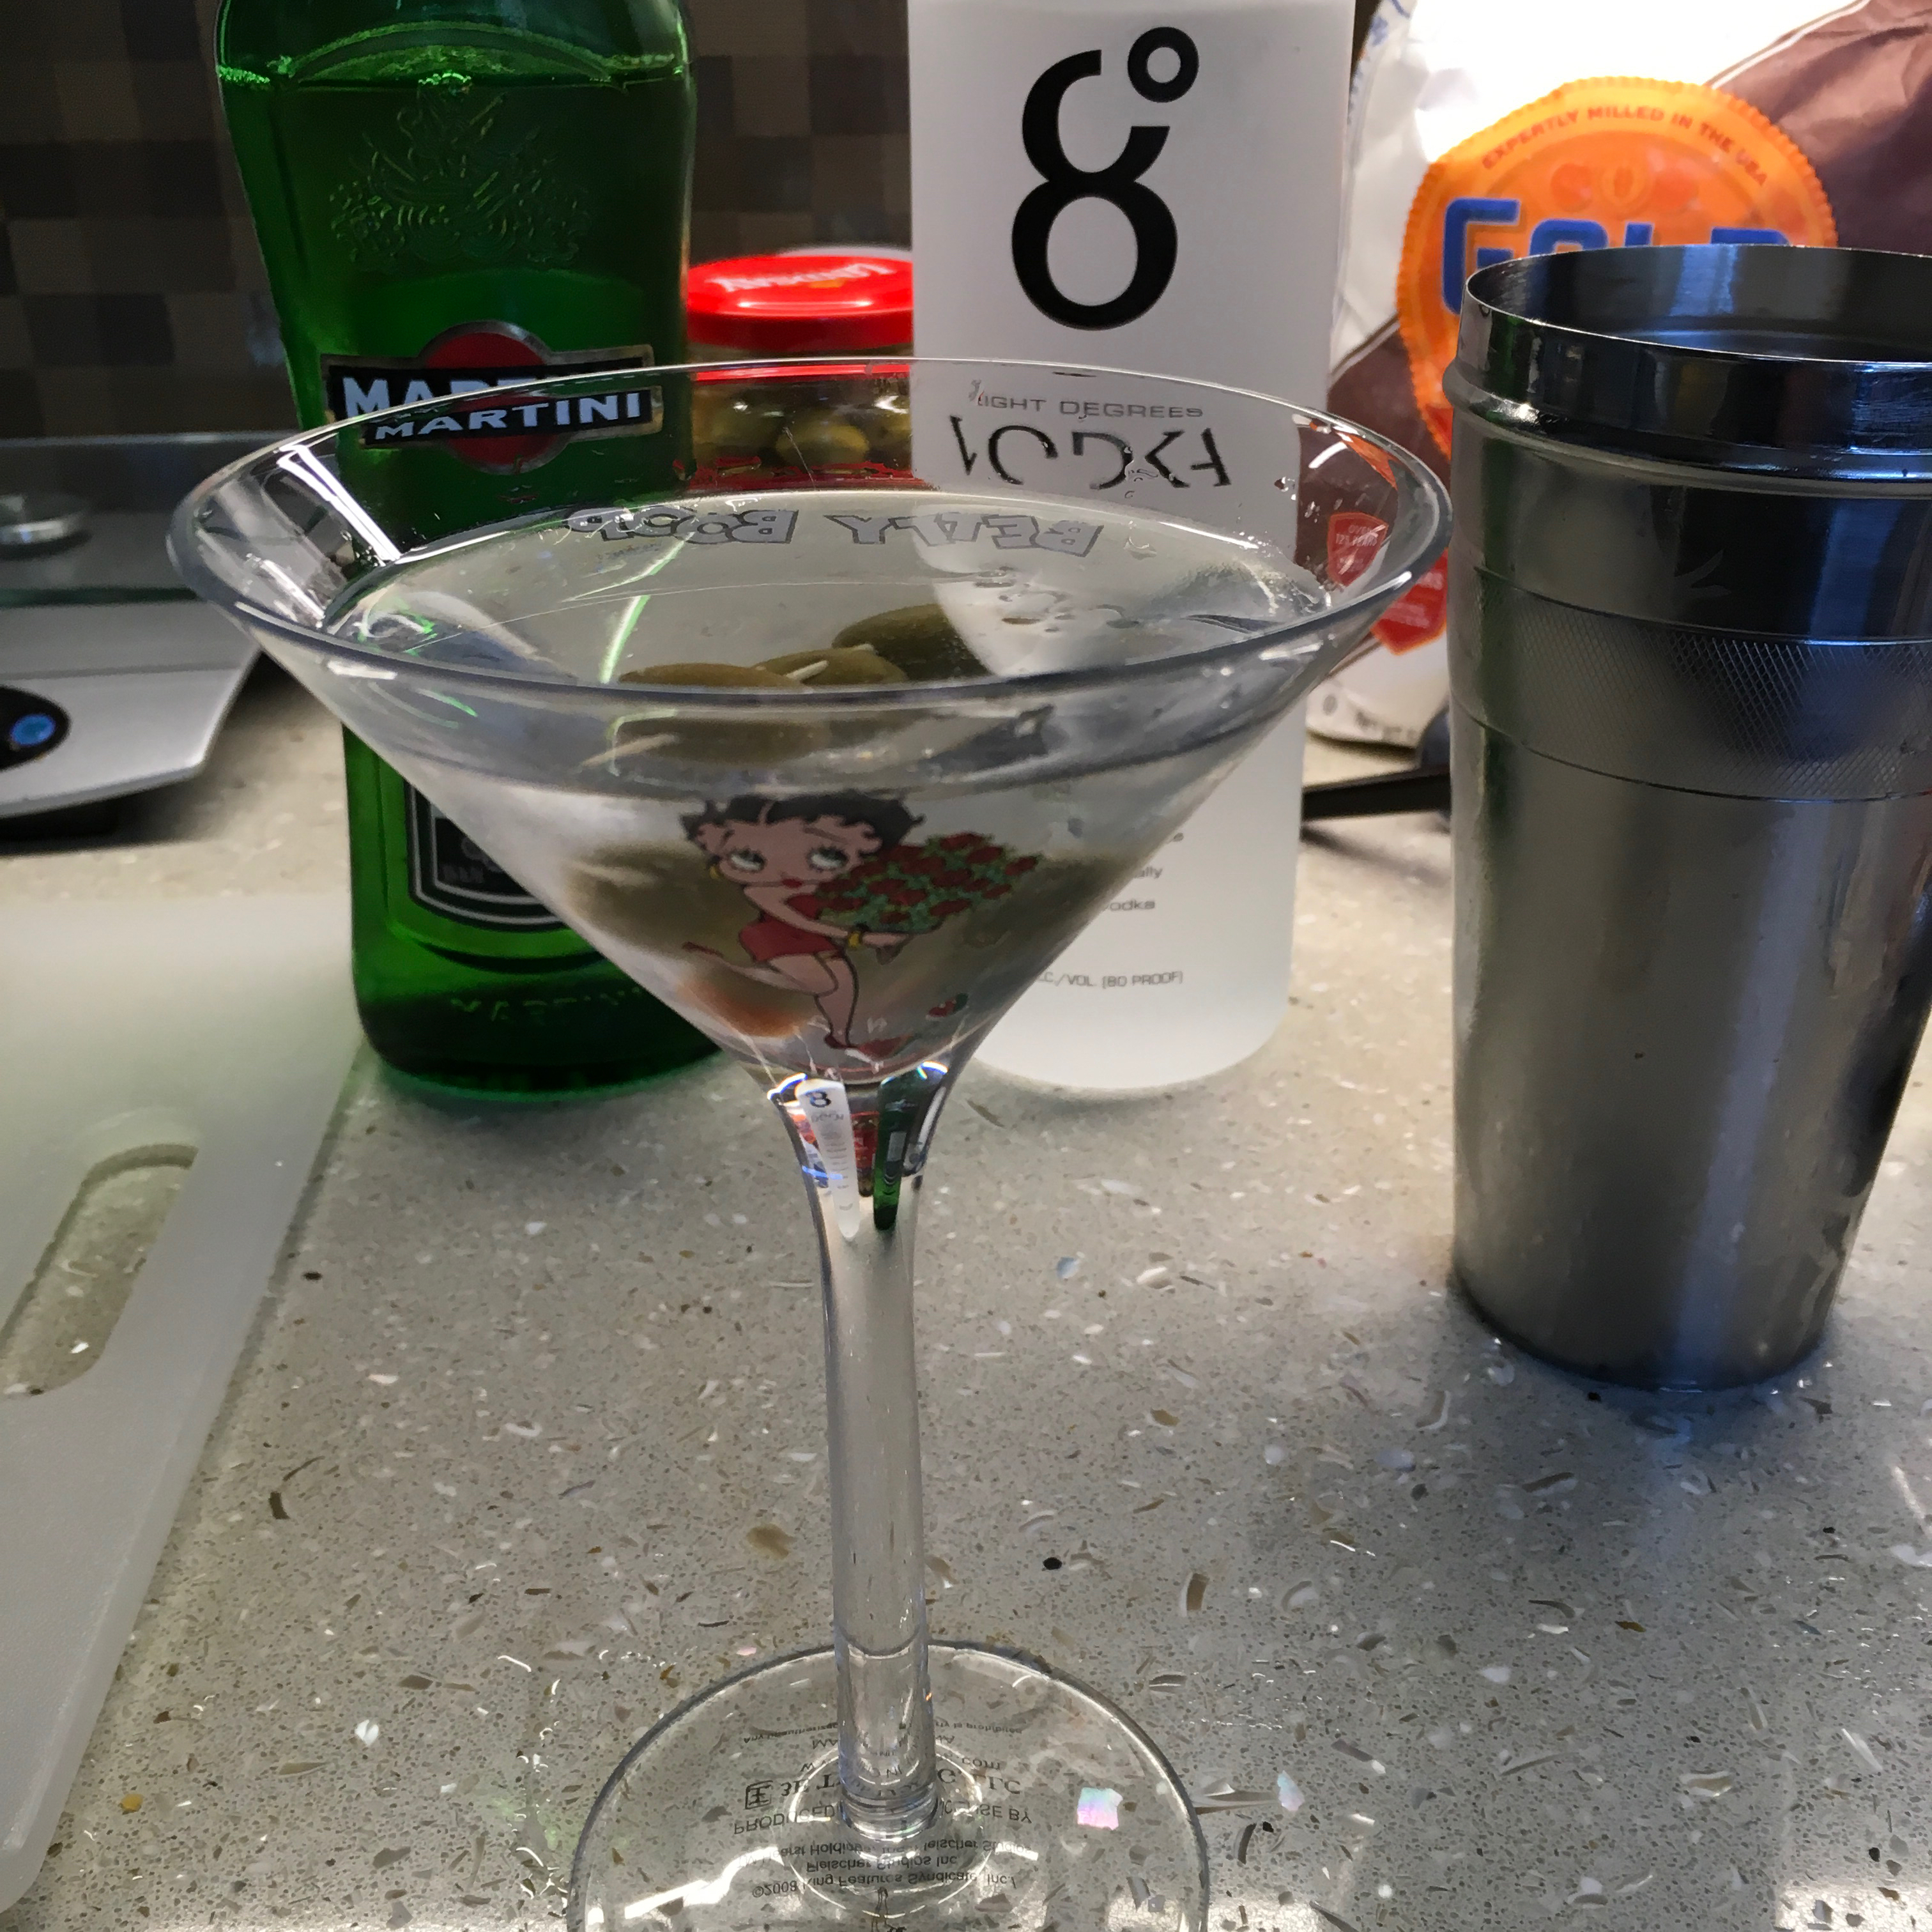 Vodka Martini Cocktail Eric Molsness